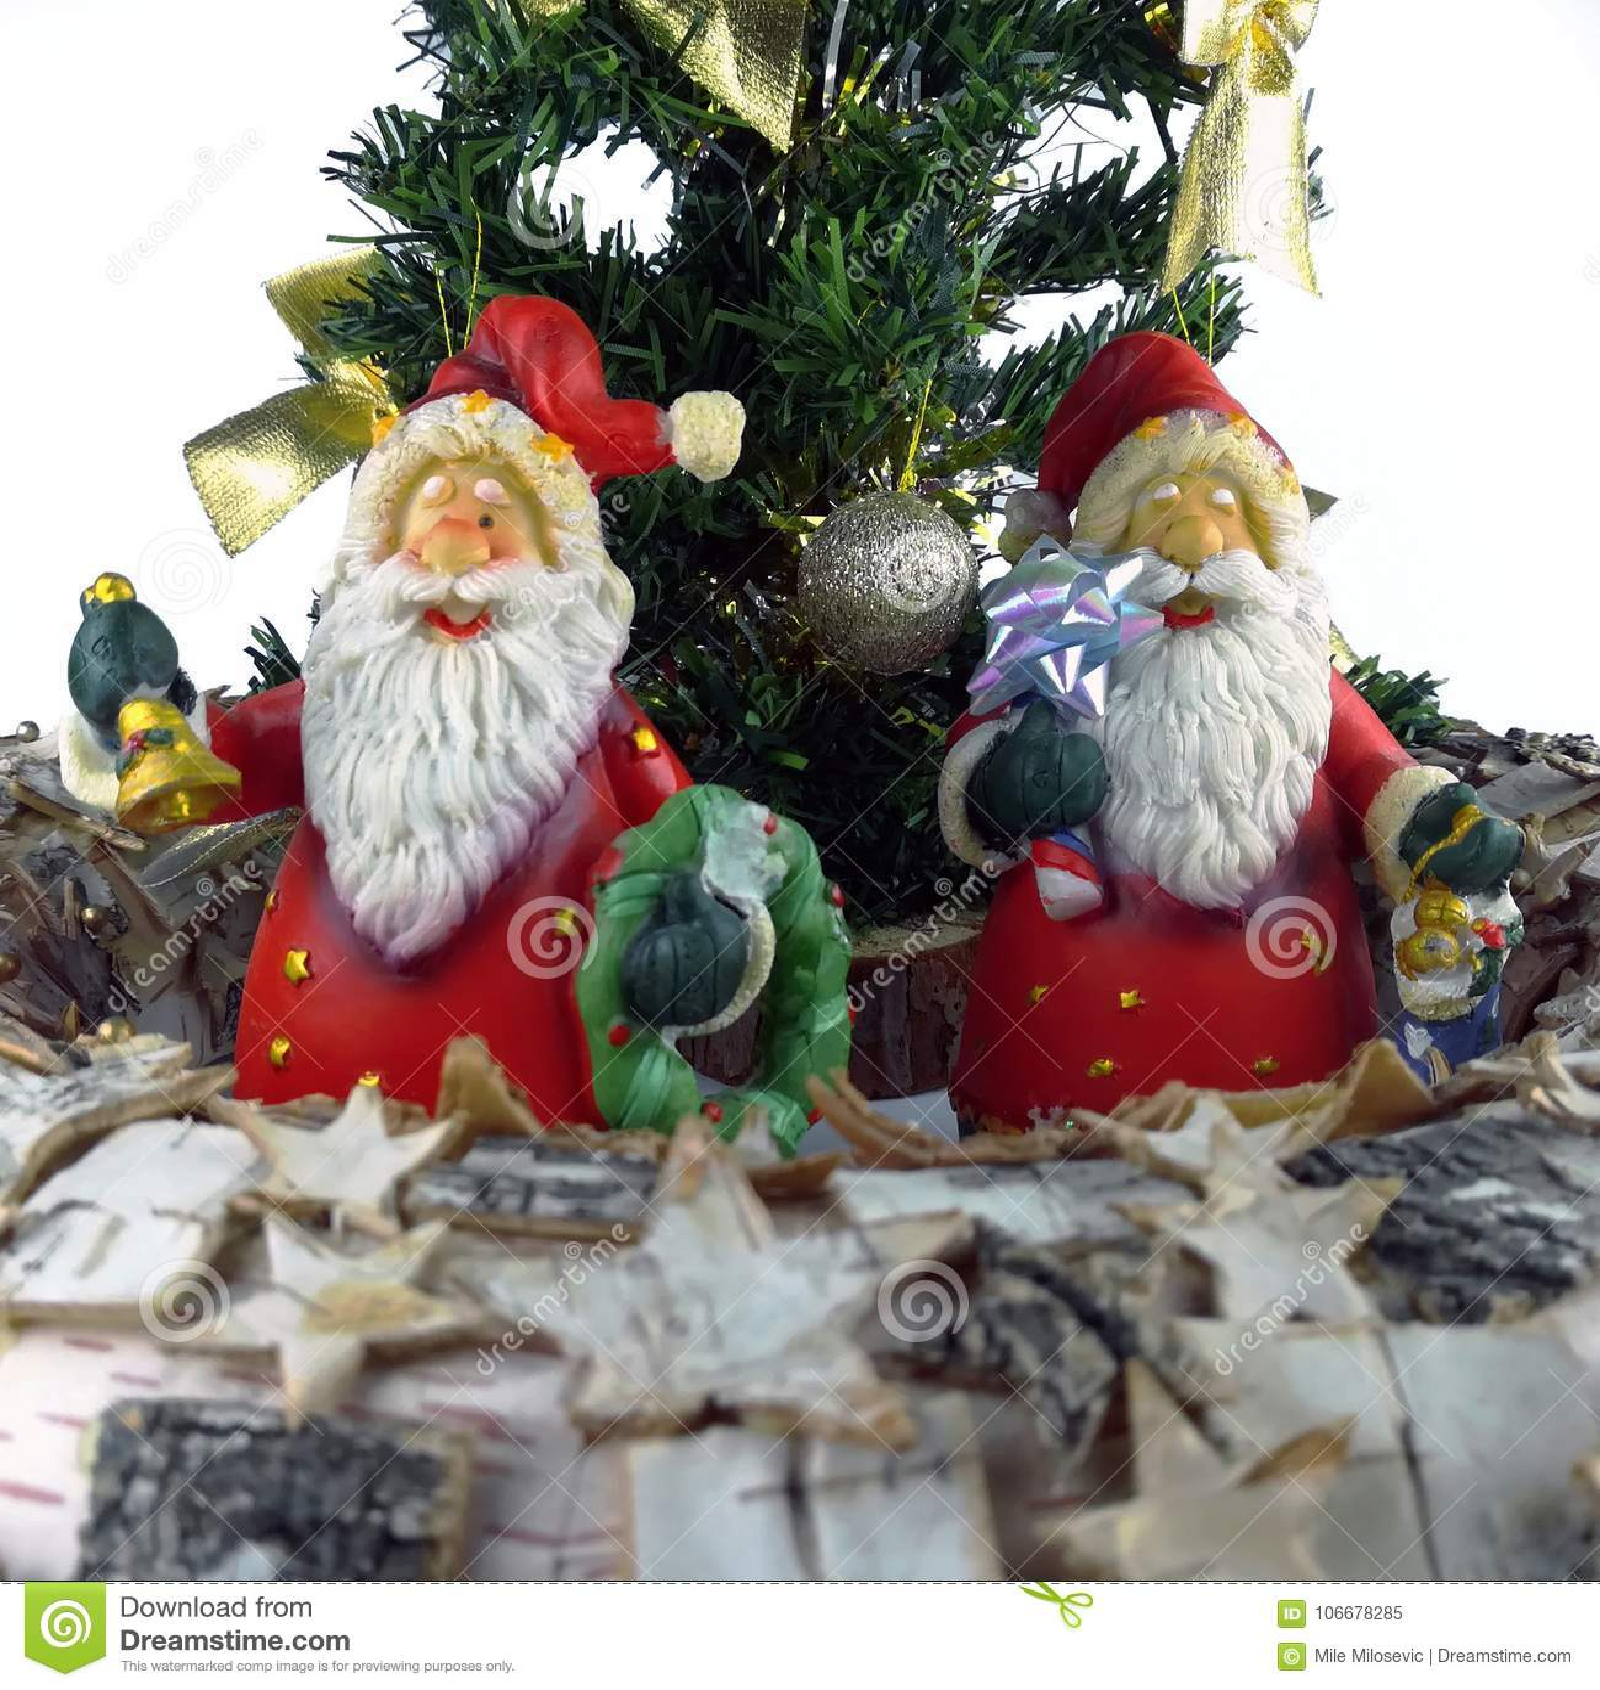 Two Santa Claus Figurine And Mini Christmas Trees